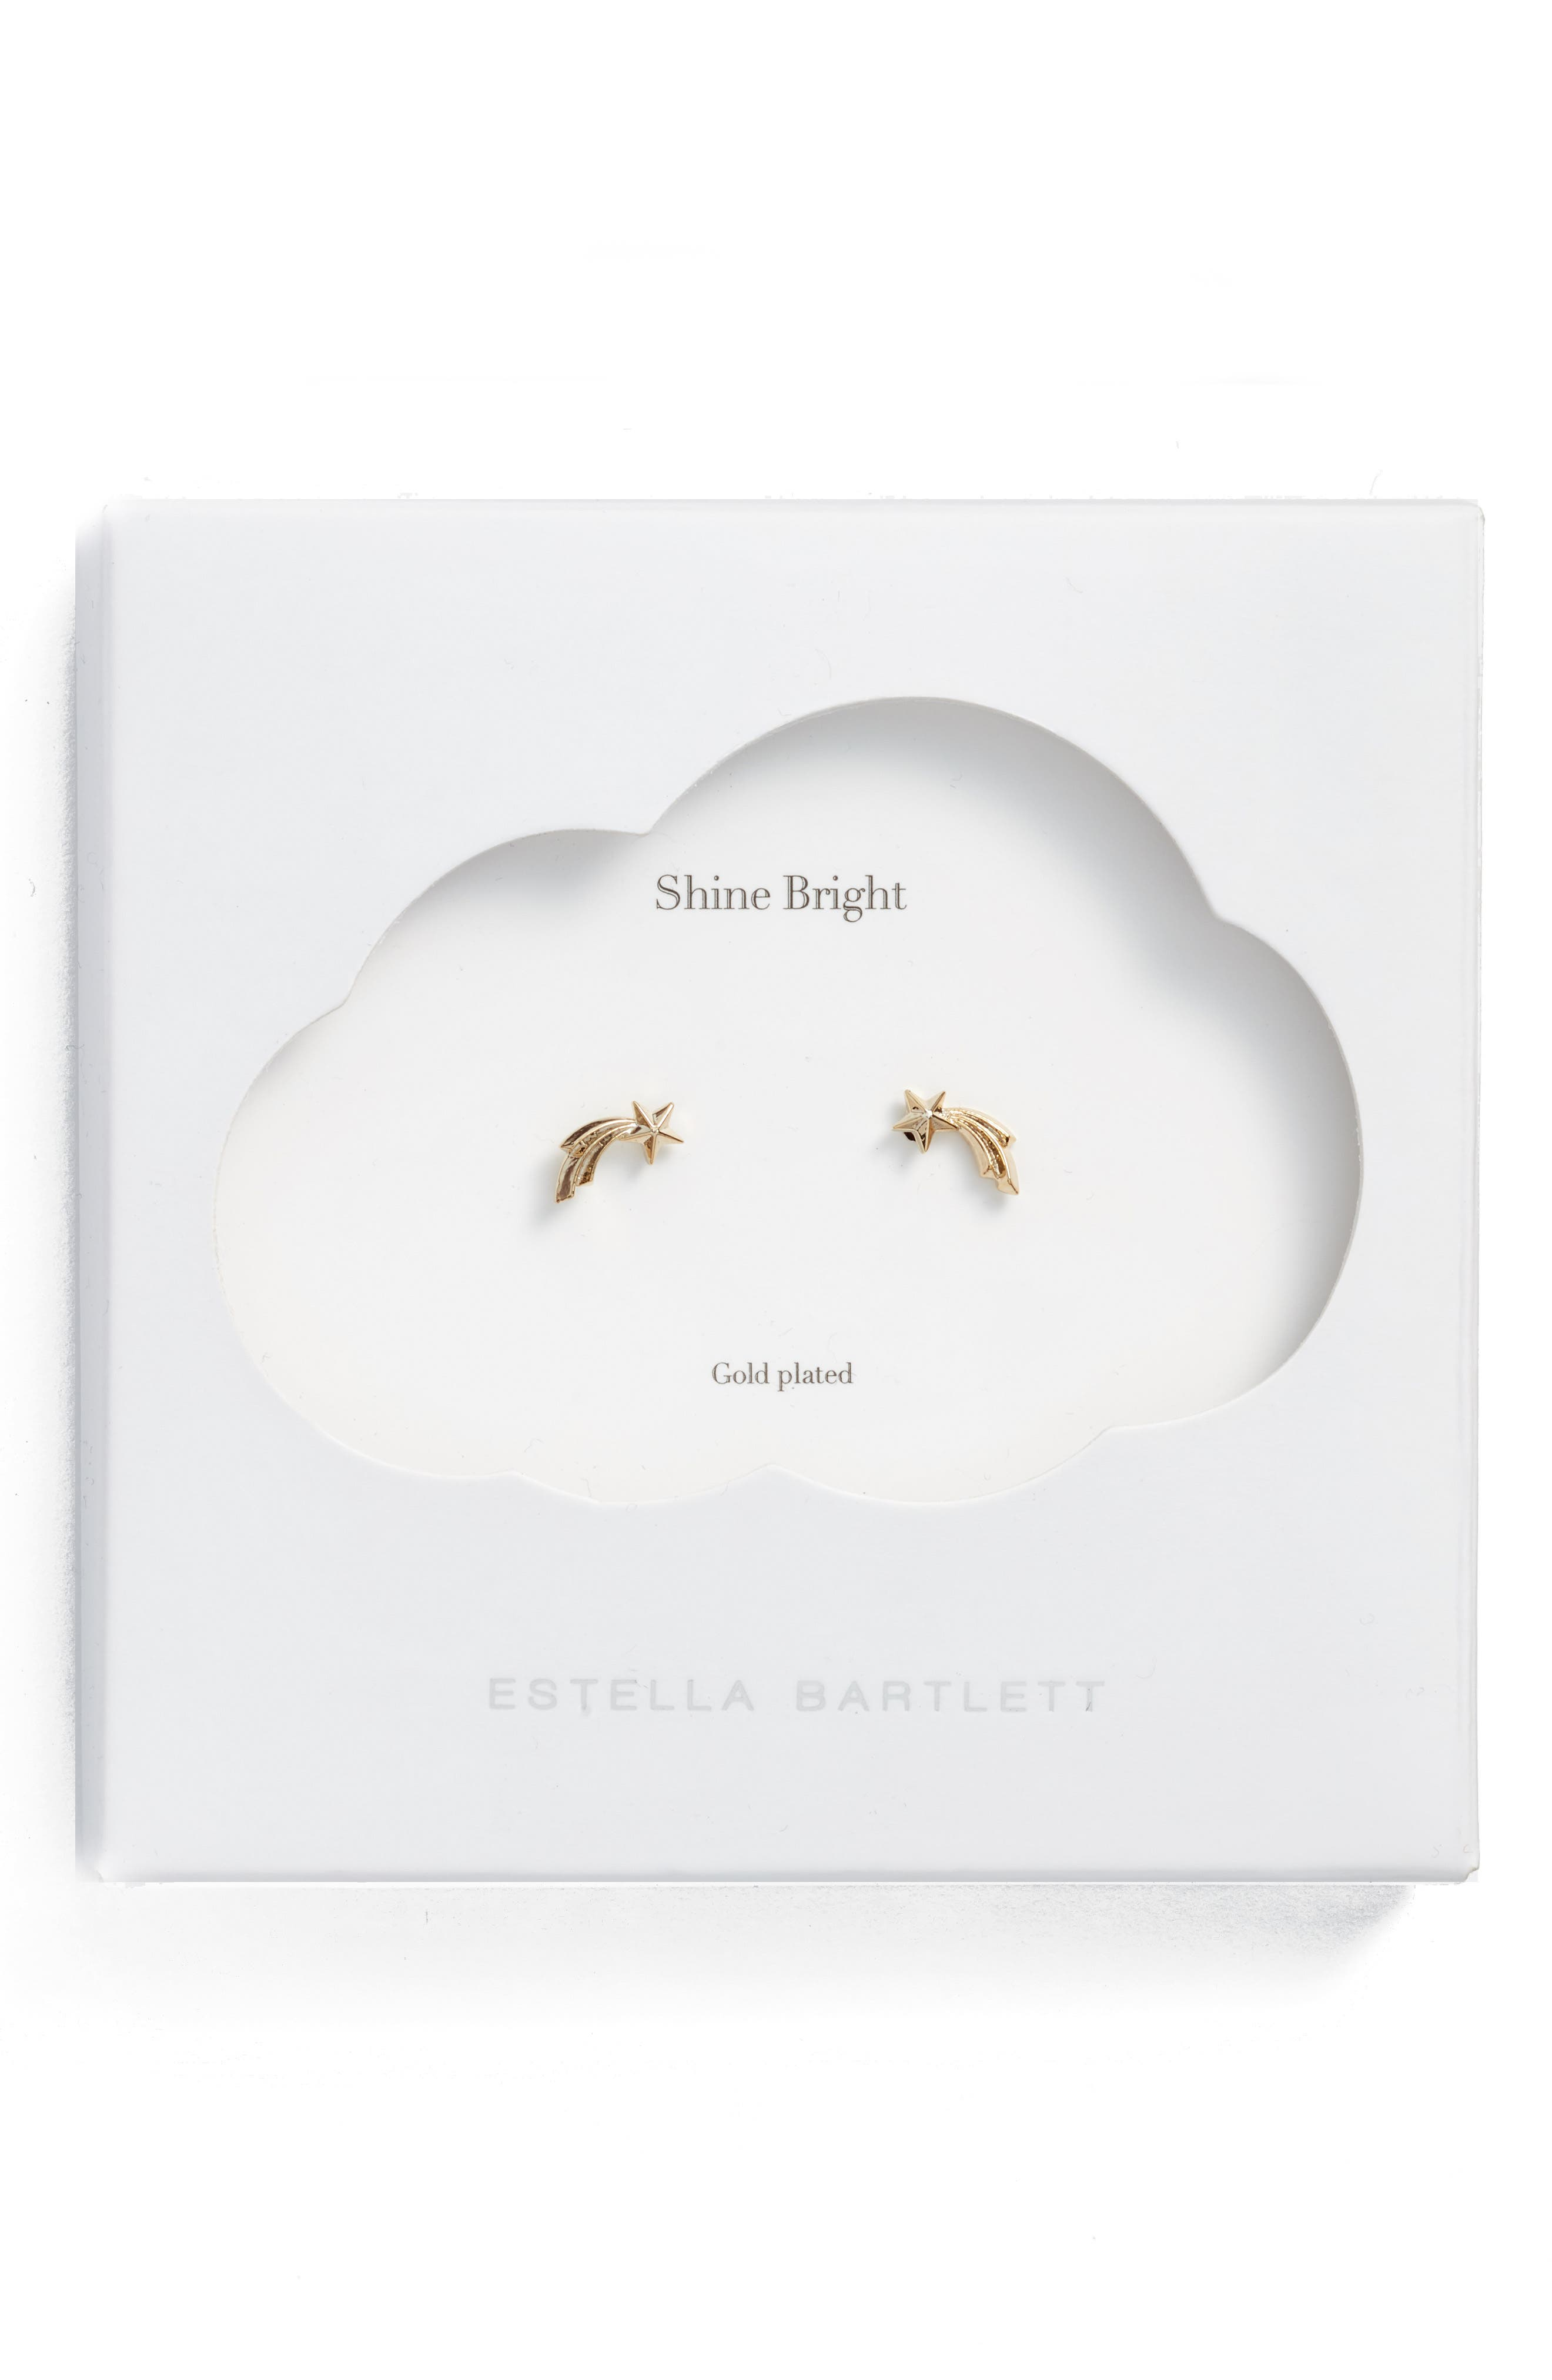 Estella Bartlett Shooting Star Stud Earrings